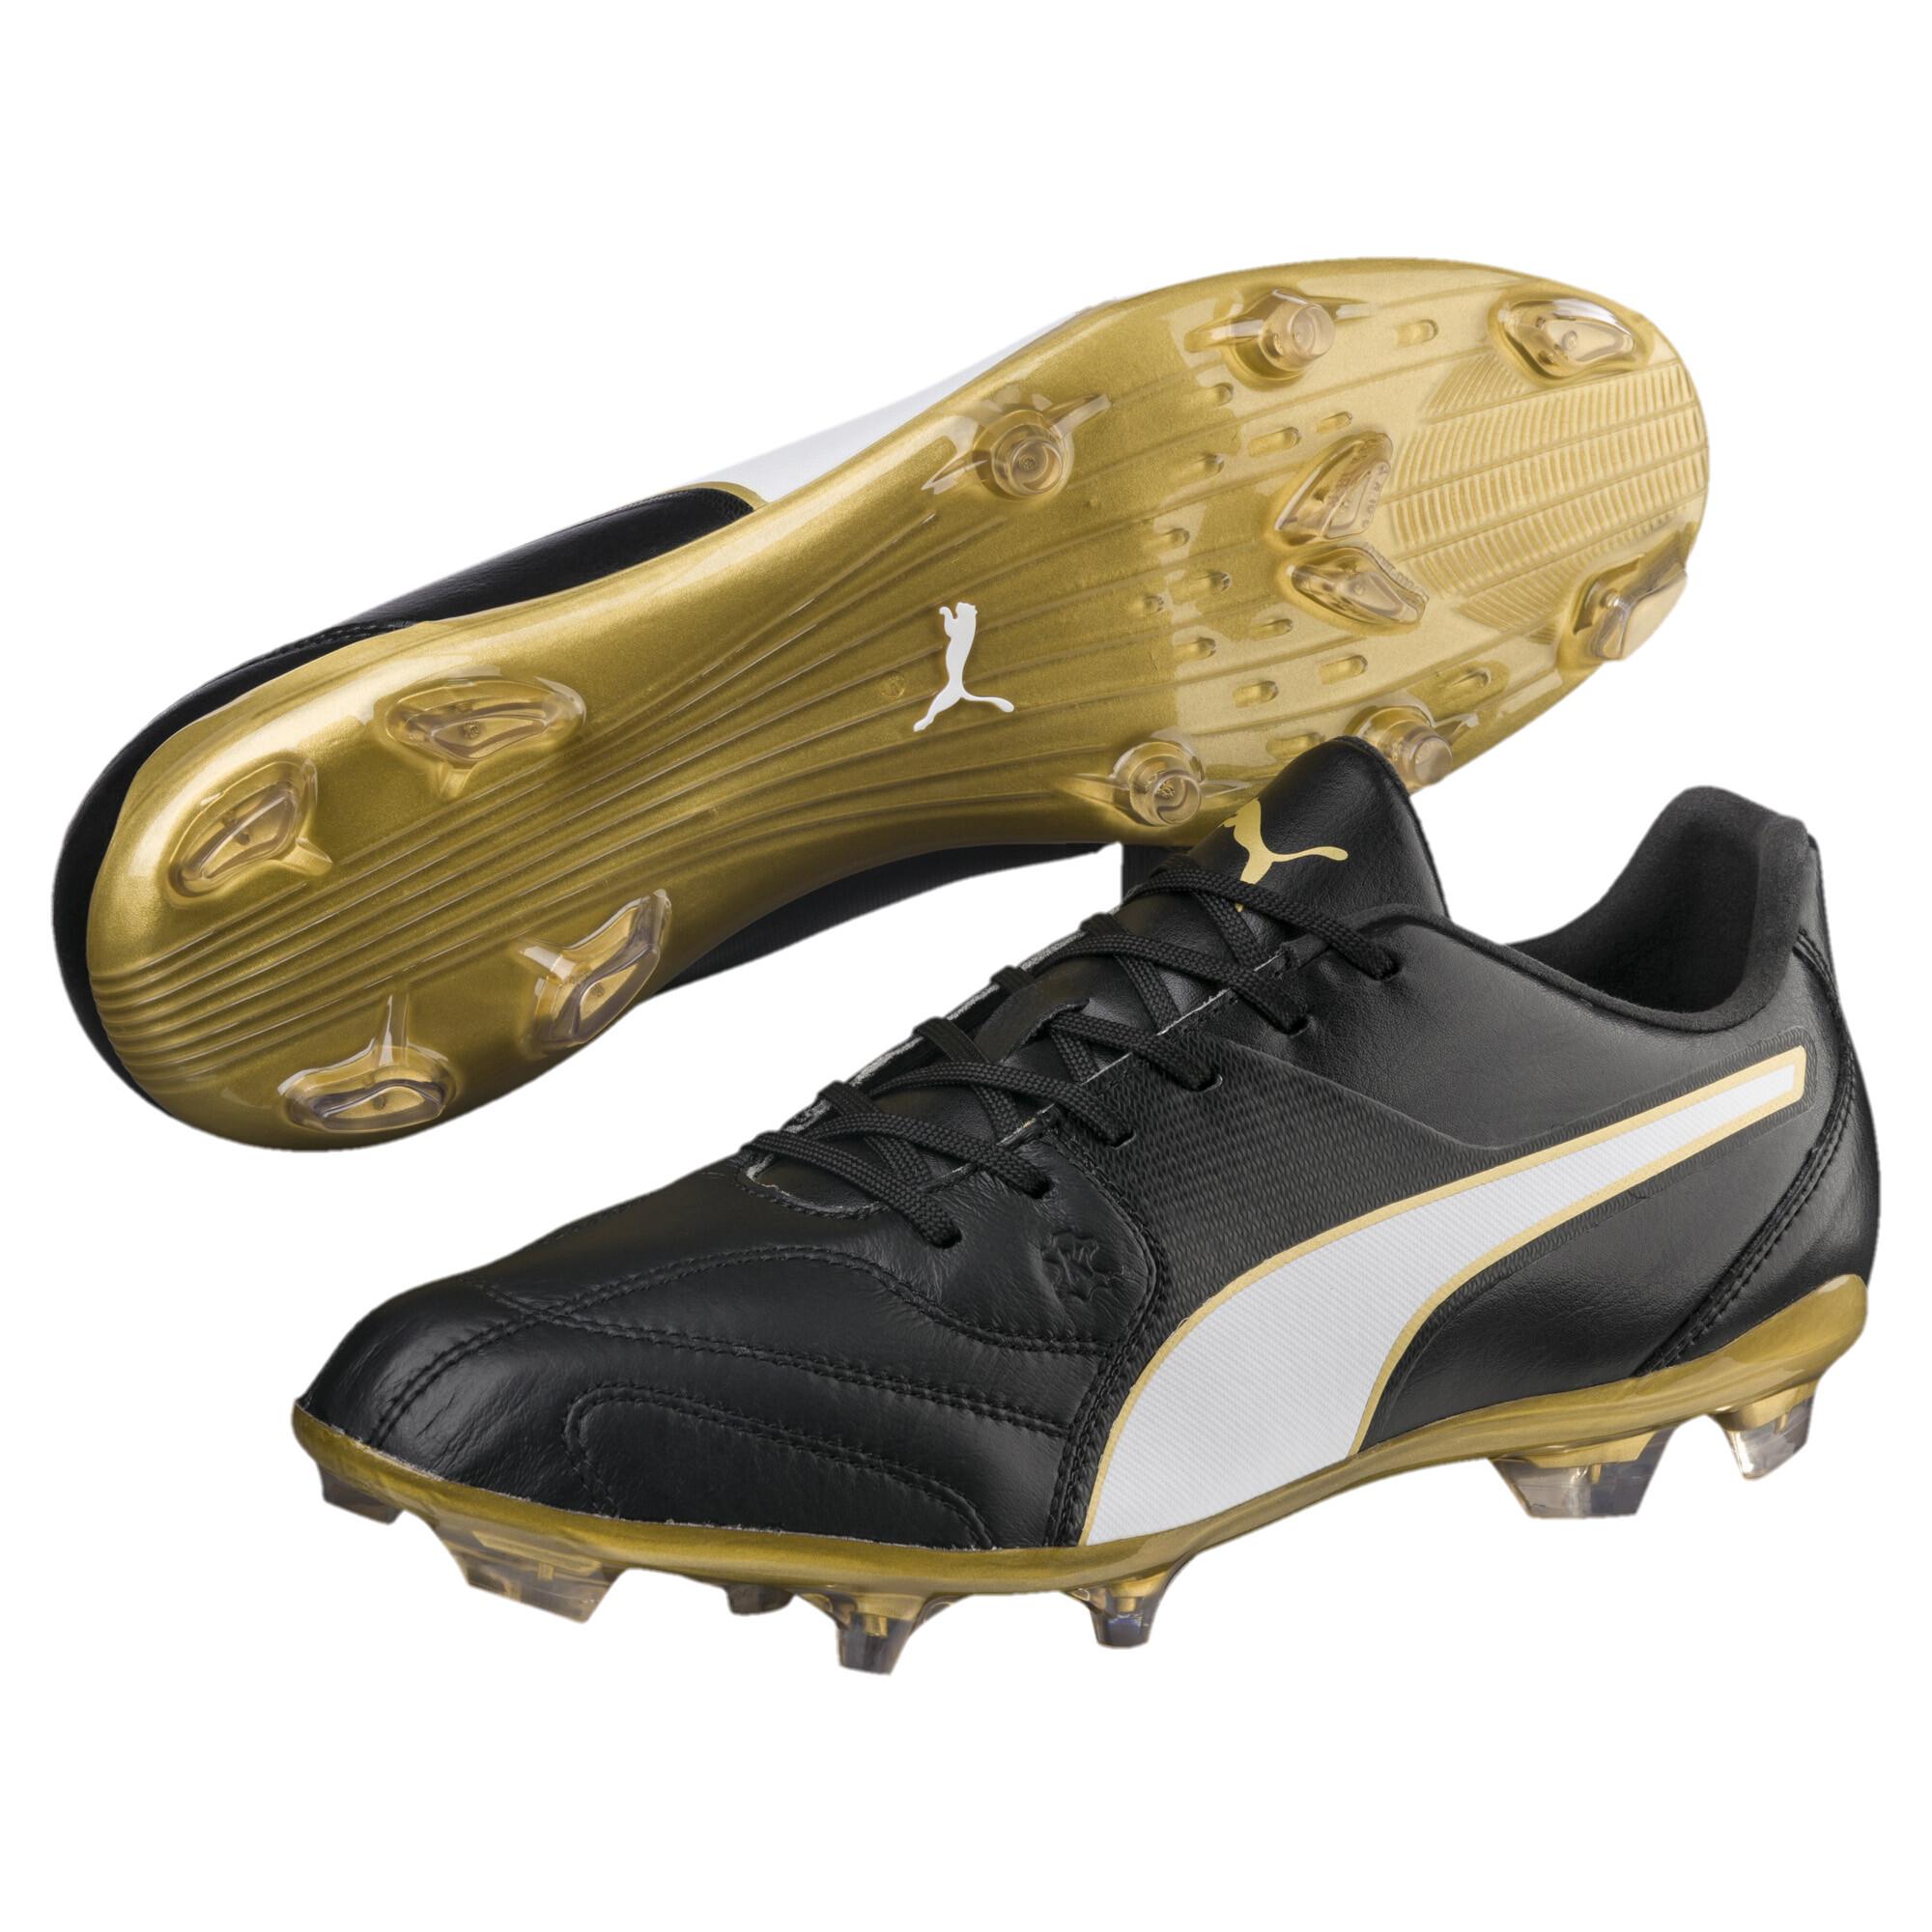 3fa0c65f2a4 Capitano II Men's Football Boots | 10 - Black | Puma